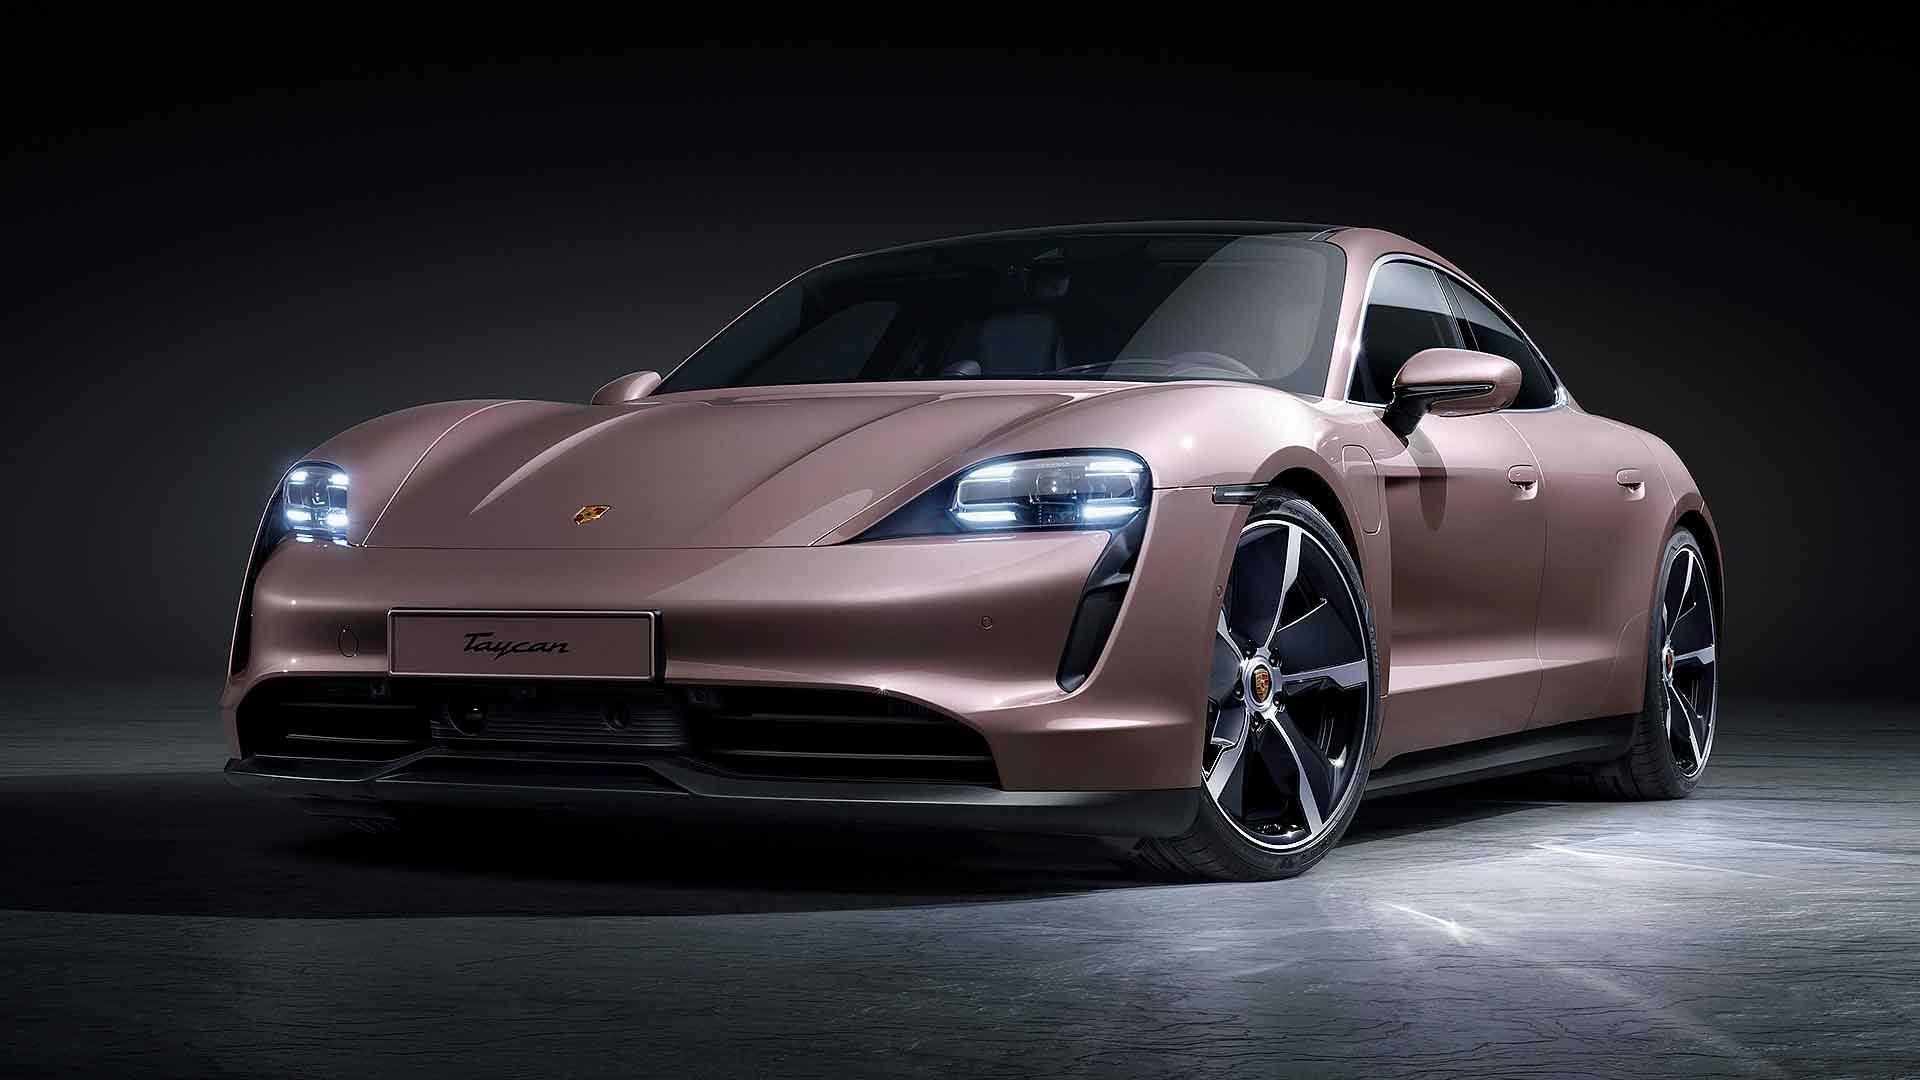 Porsche launches £70k entry-level Taycan